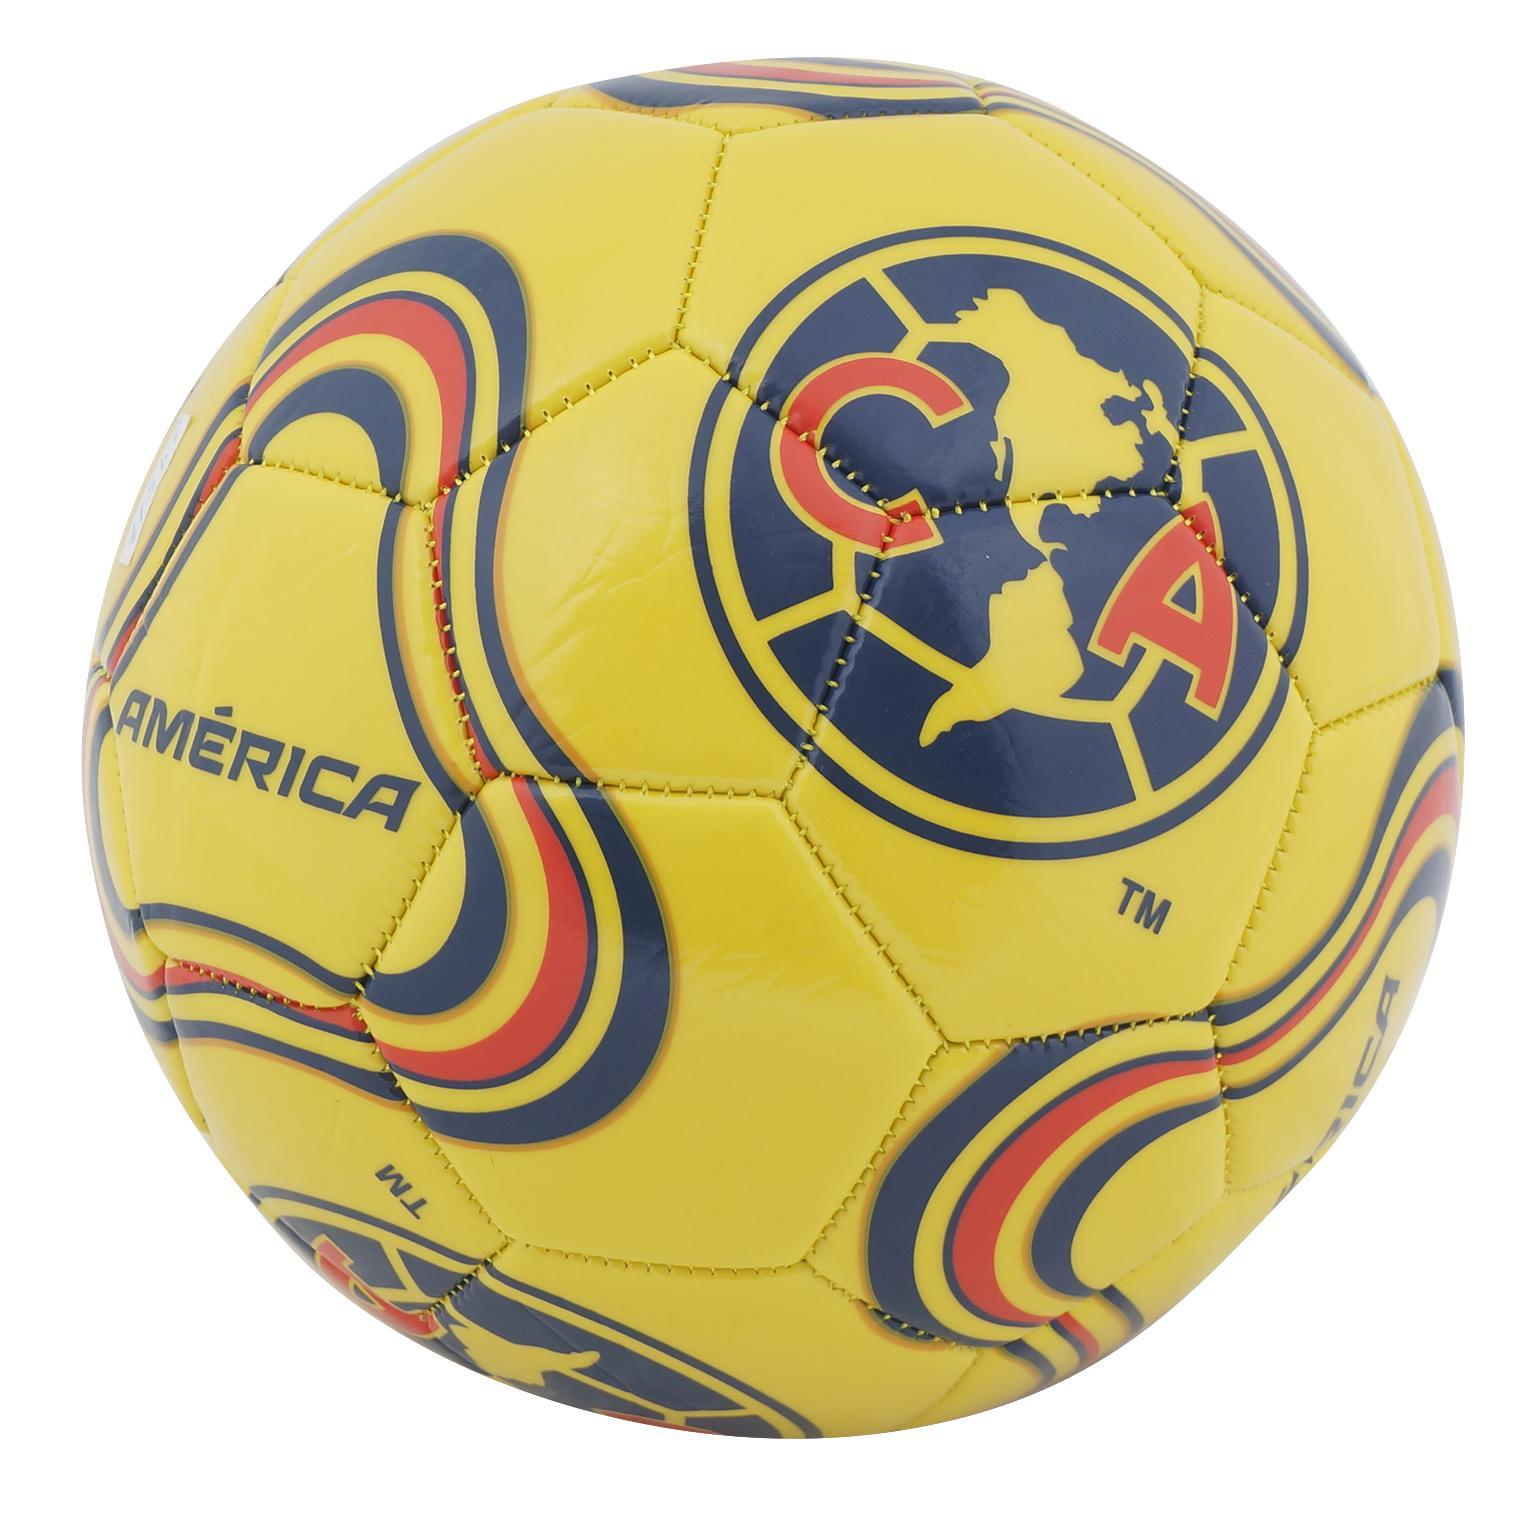 America SOCCER Ball - Size #5 [2332843]